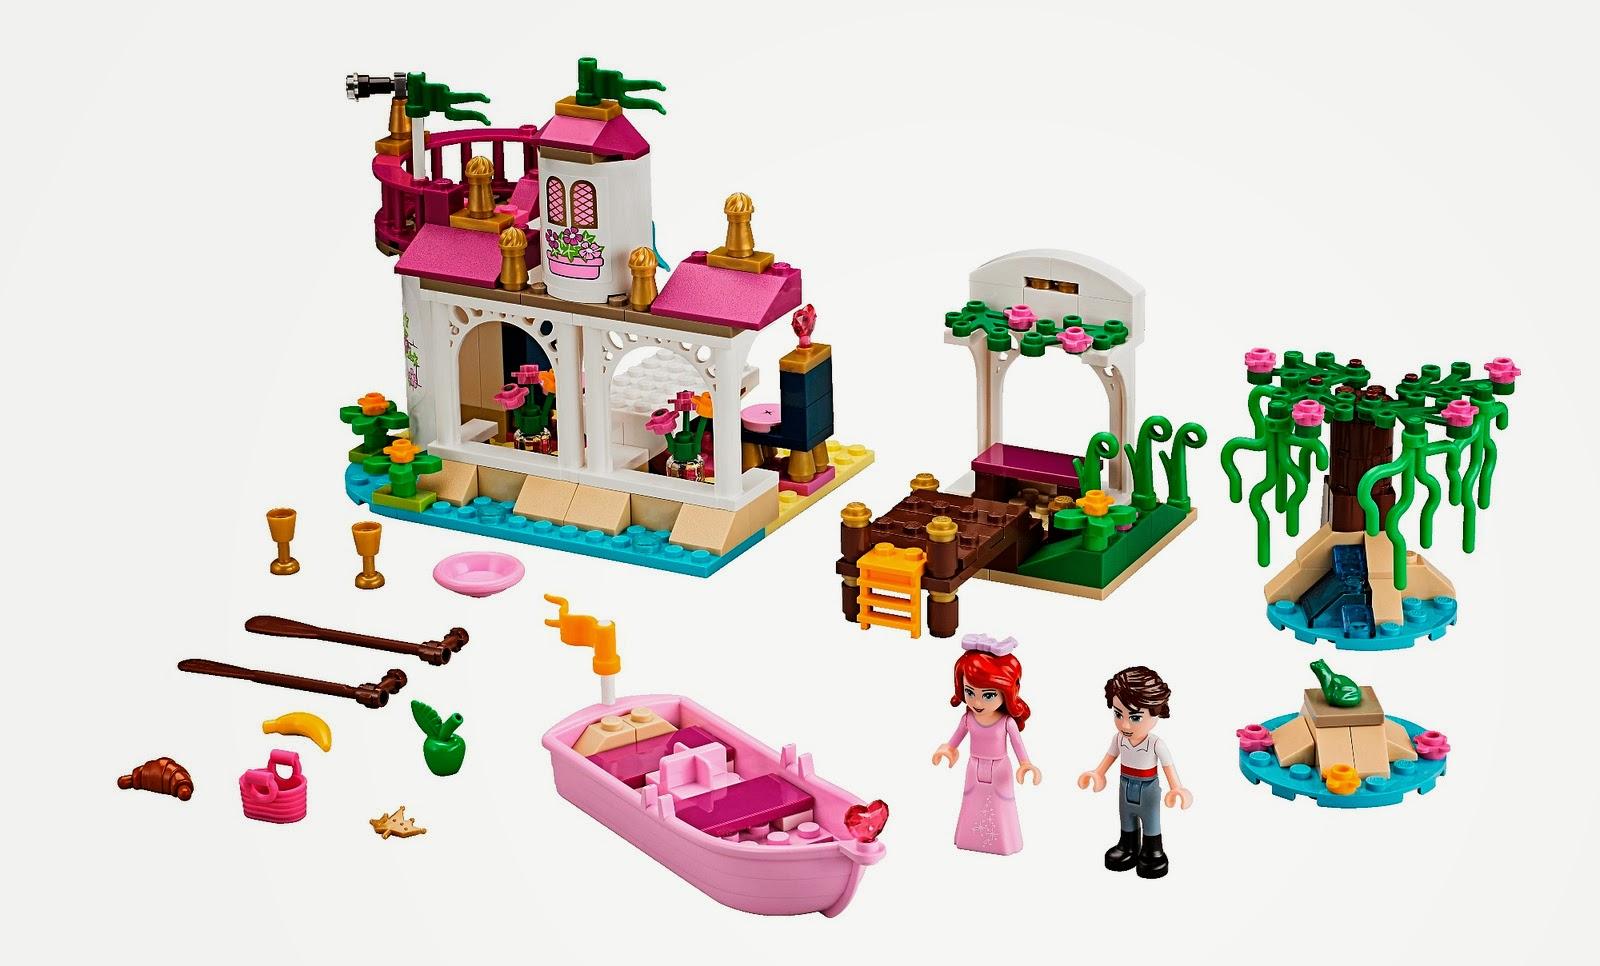 detoyz shop 2014 lego disney princess sets. Black Bedroom Furniture Sets. Home Design Ideas